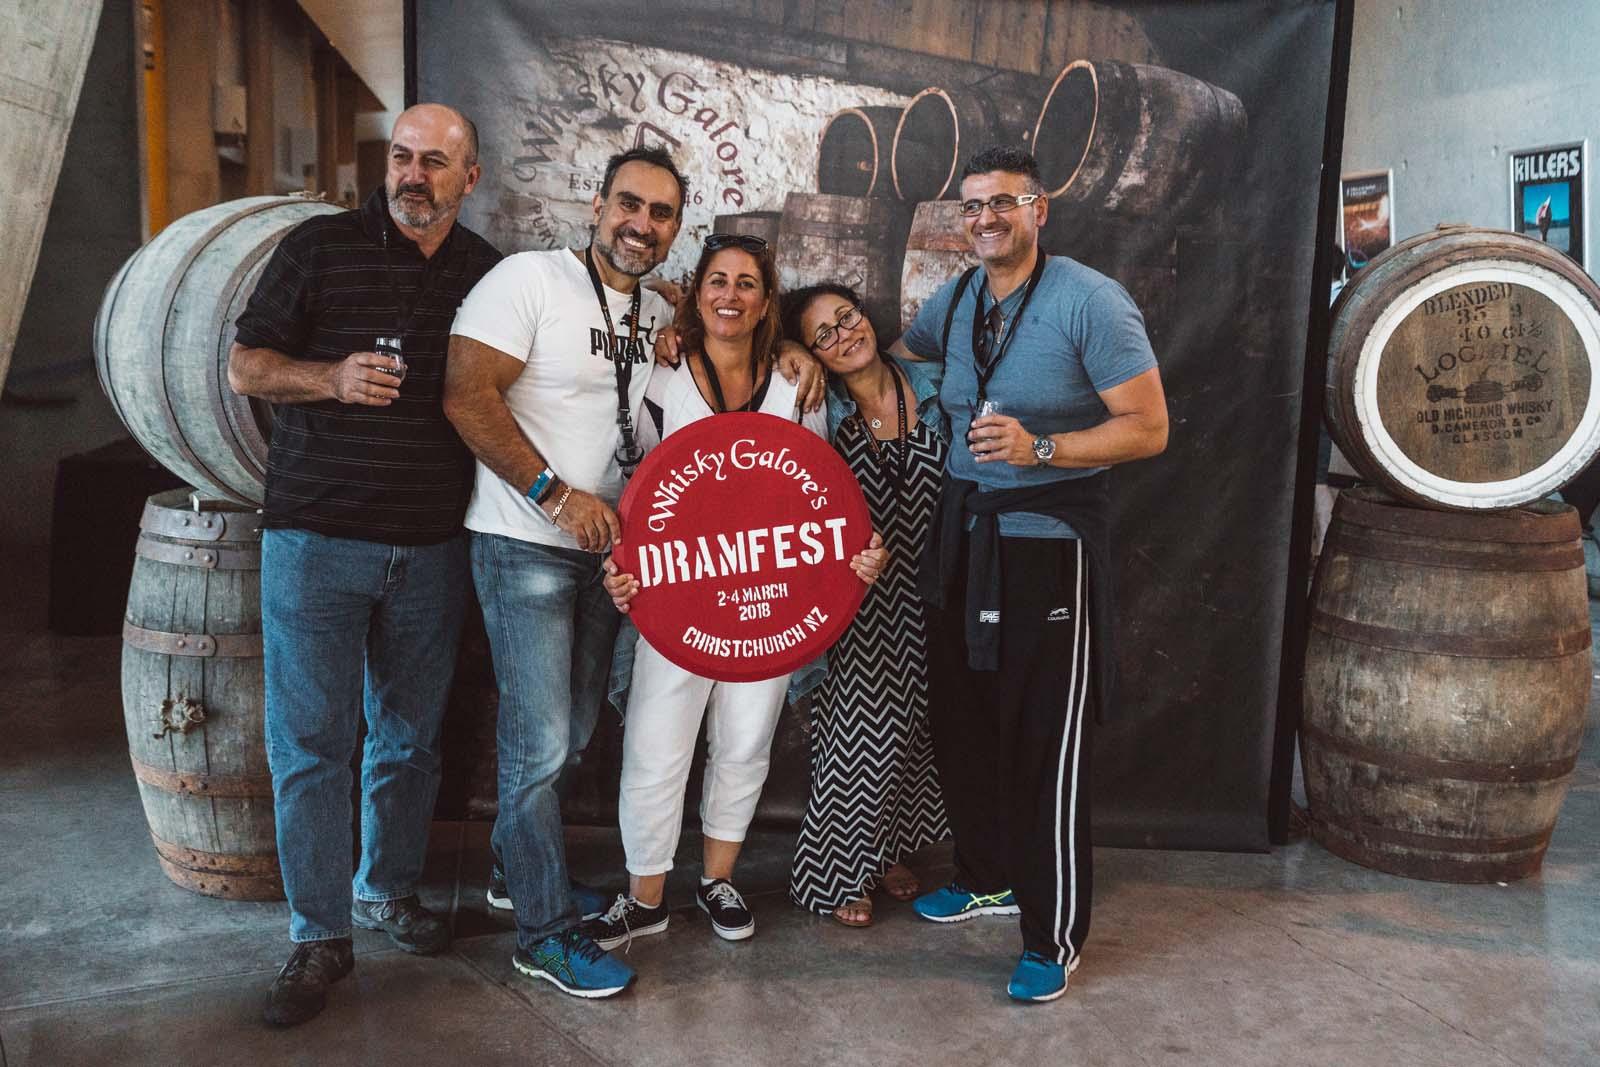 Dramfest 2018 for Whisky Galore-104.jpg